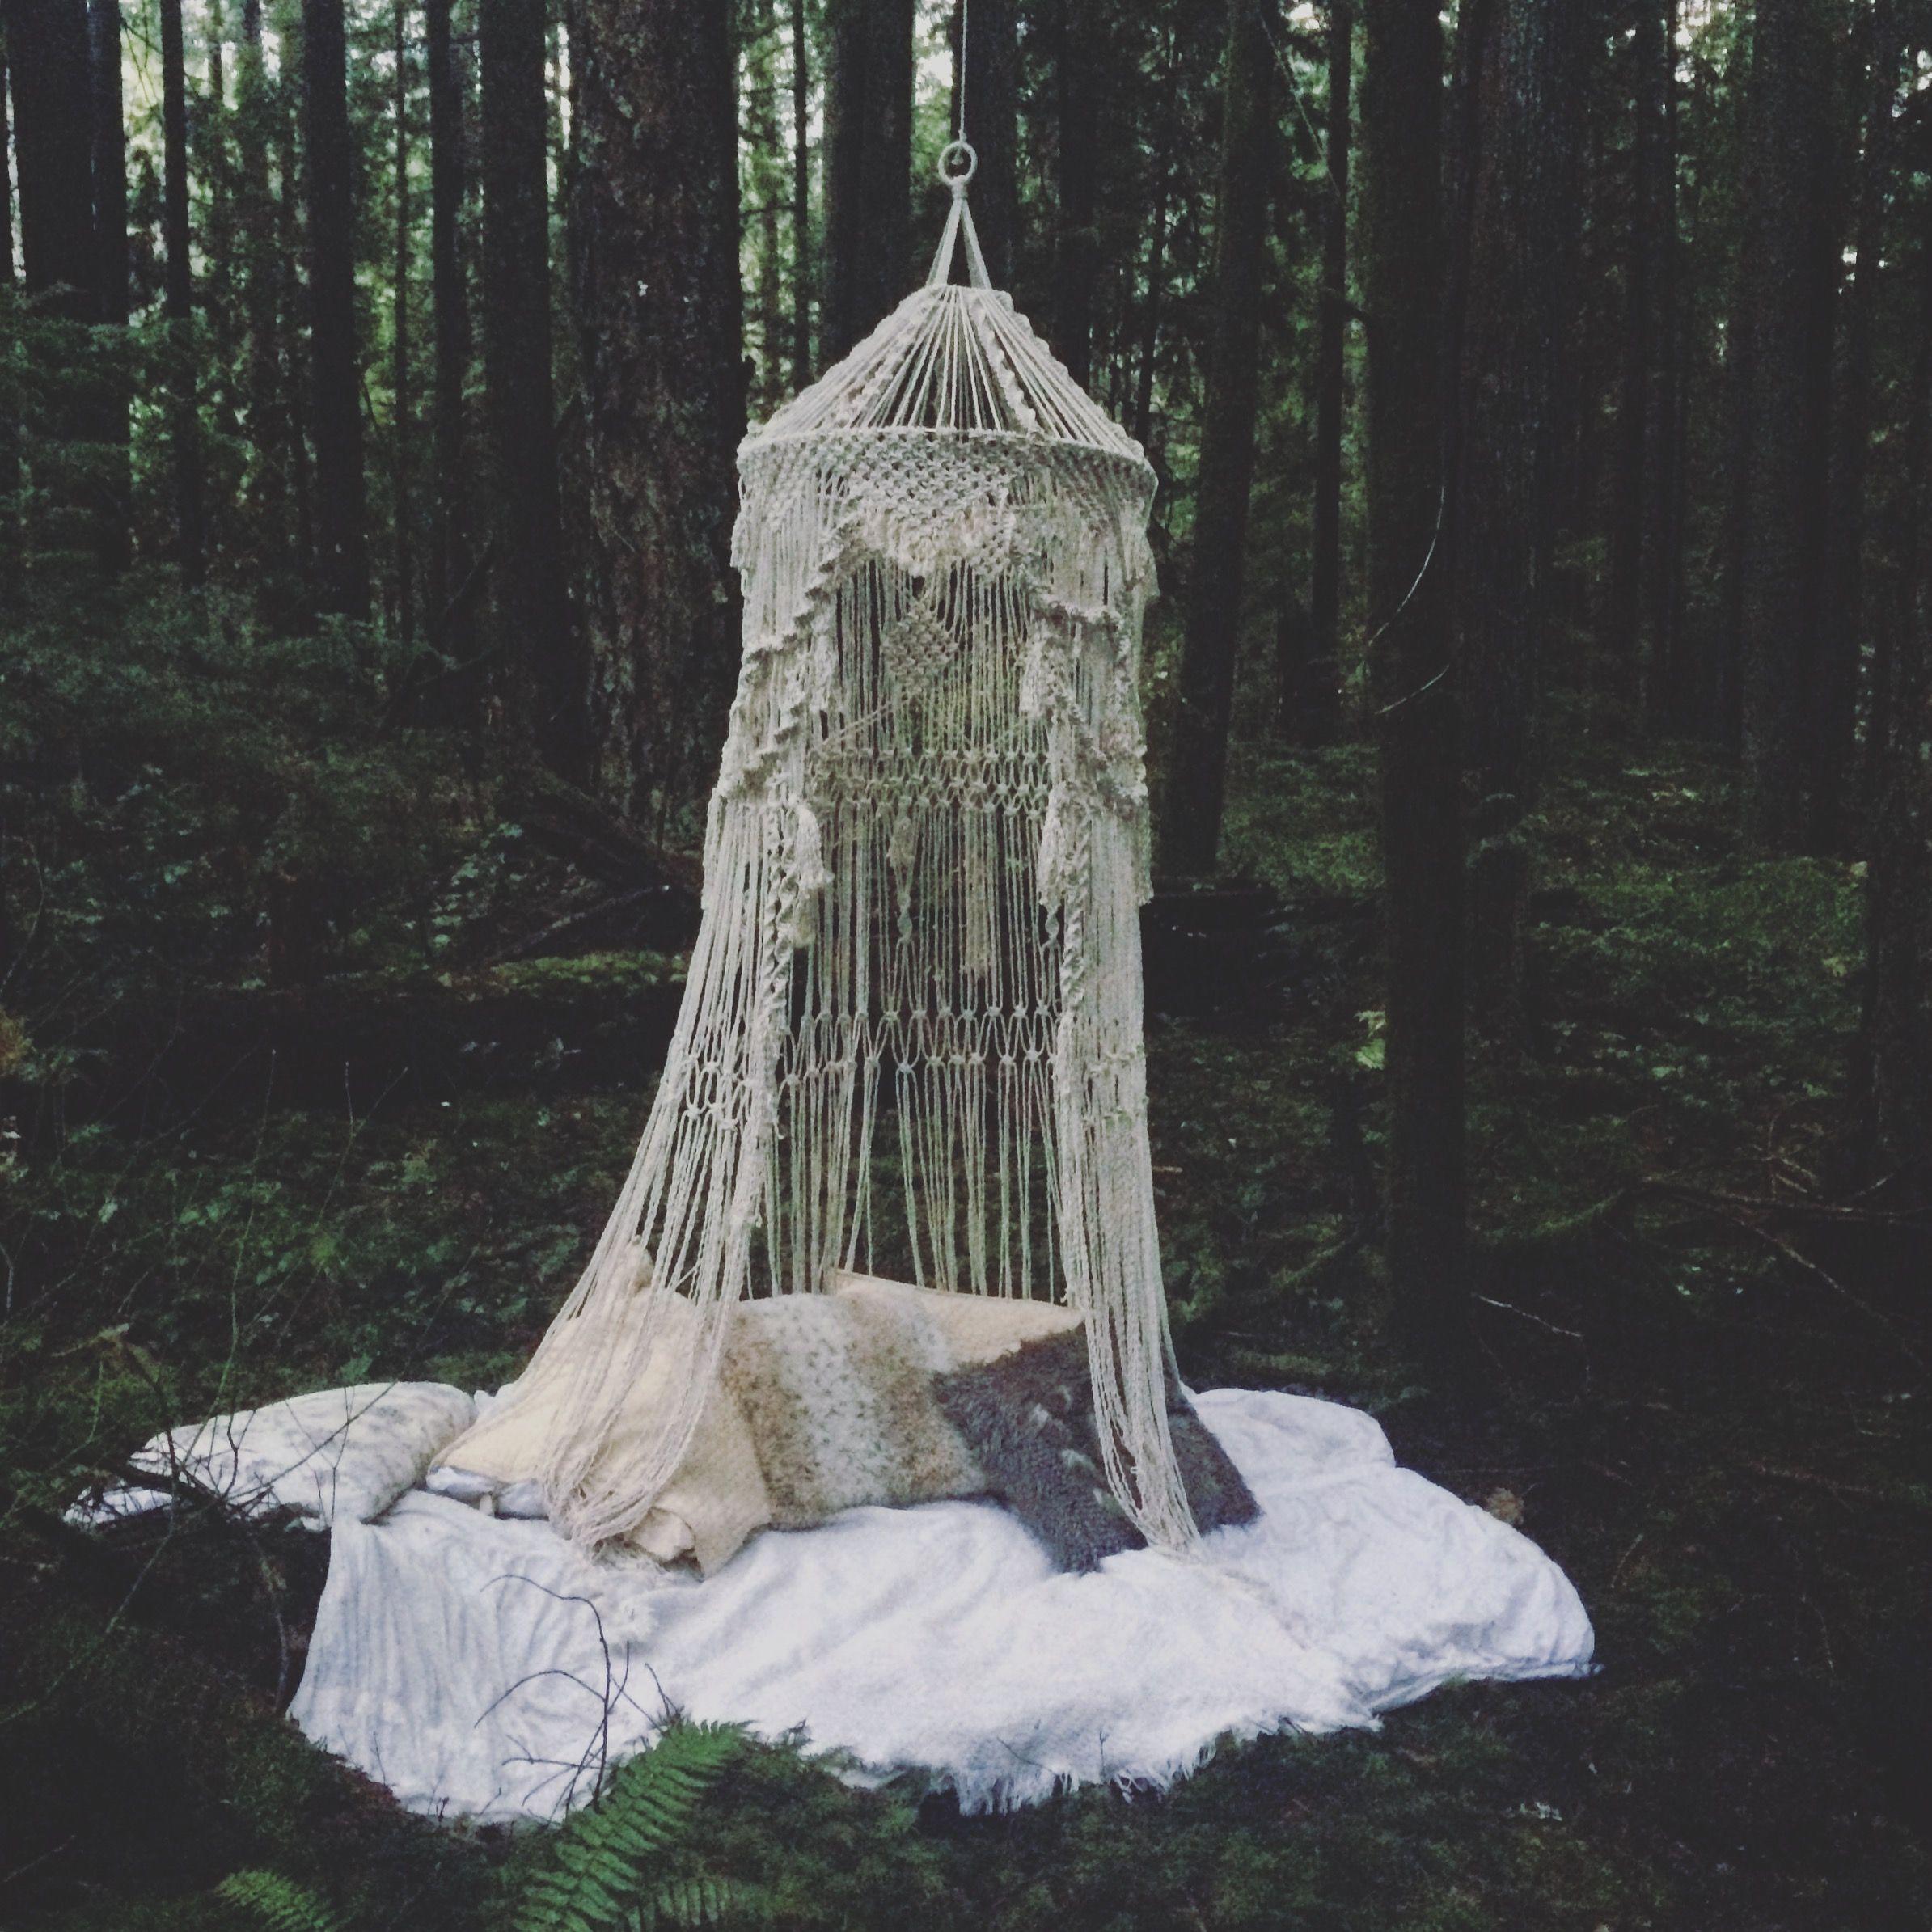 Bohemian Macrame Canopy | Macrame | Pinterest | Canopy ...